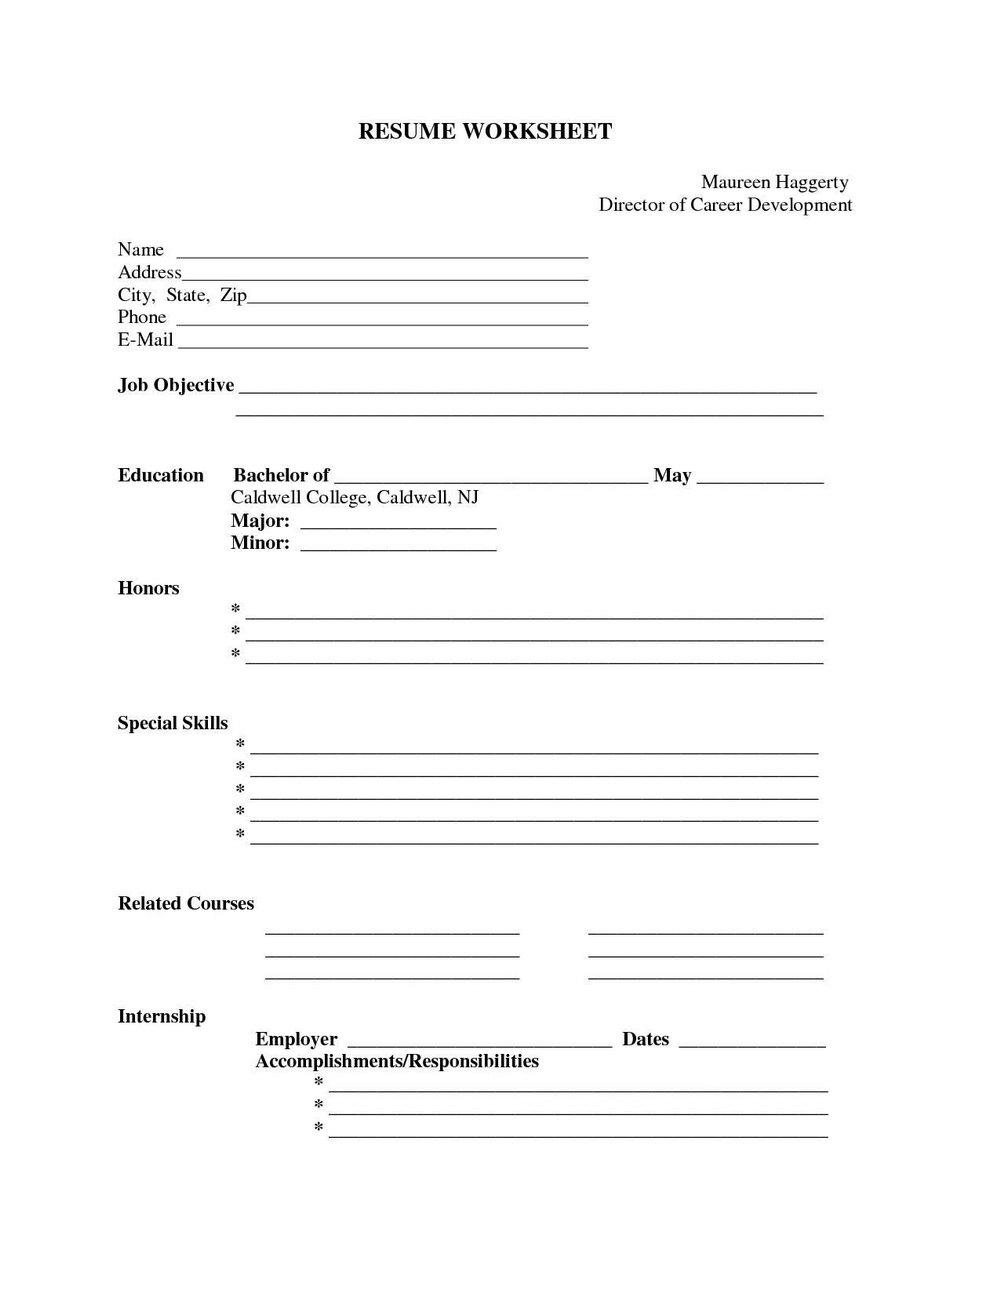 Free Resume Blank Printable Forms